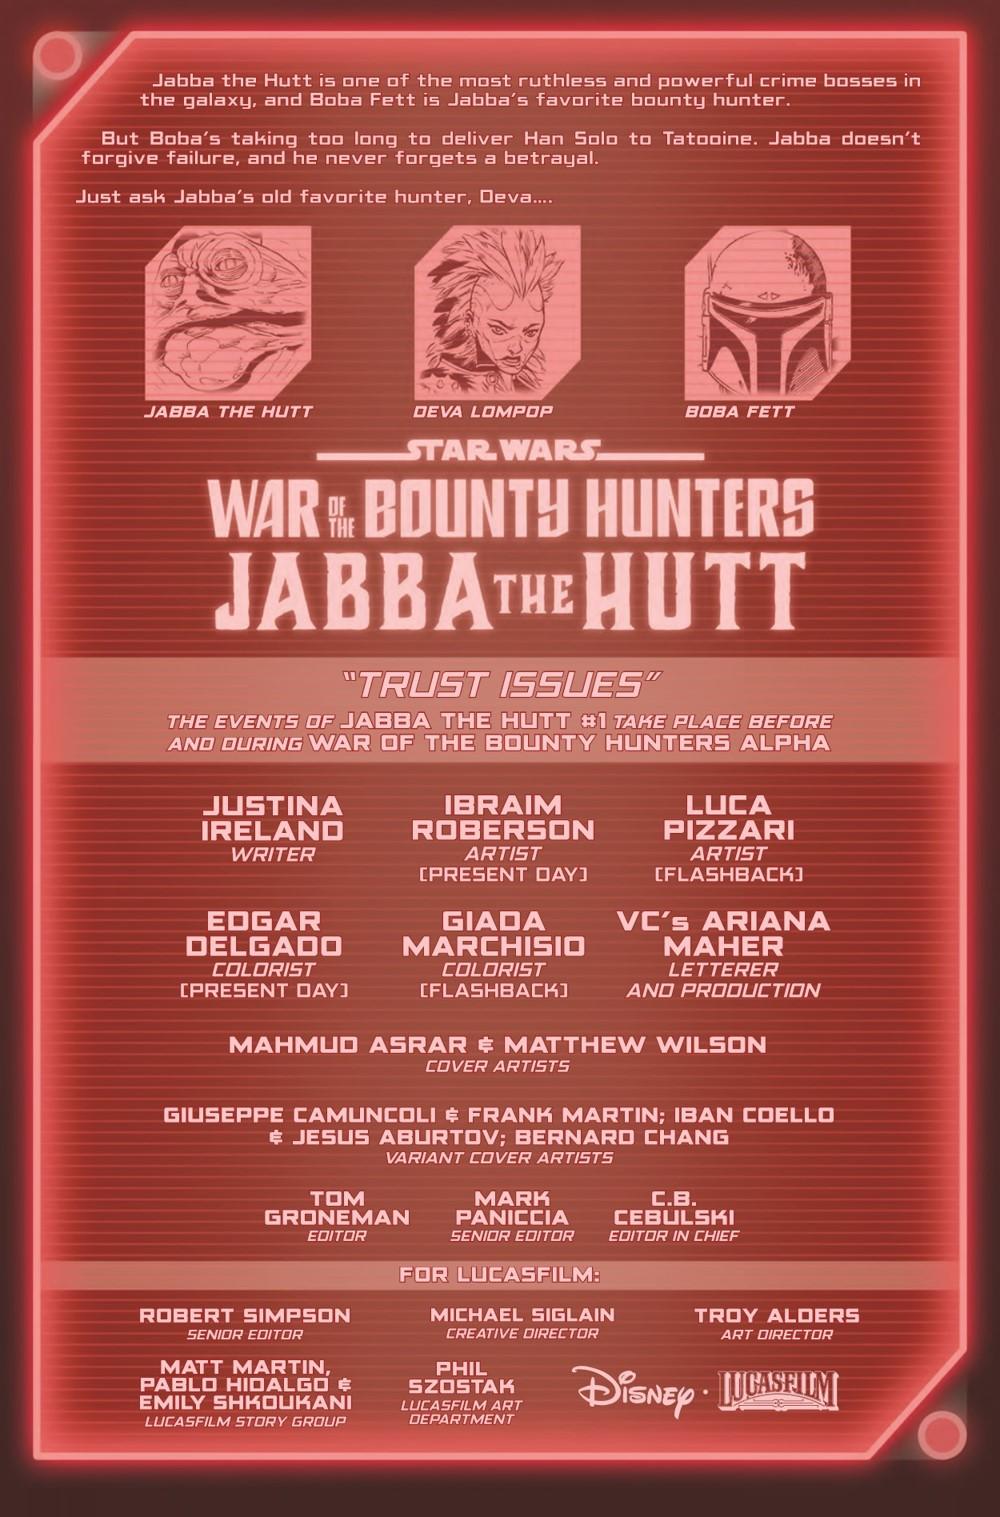 STWWAROTBHJABBAT2021001_Preview-2 ComicList Previews: STAR WARS WAR OF THE BOUNTY HUNTERS JABBA THE HUTT #1